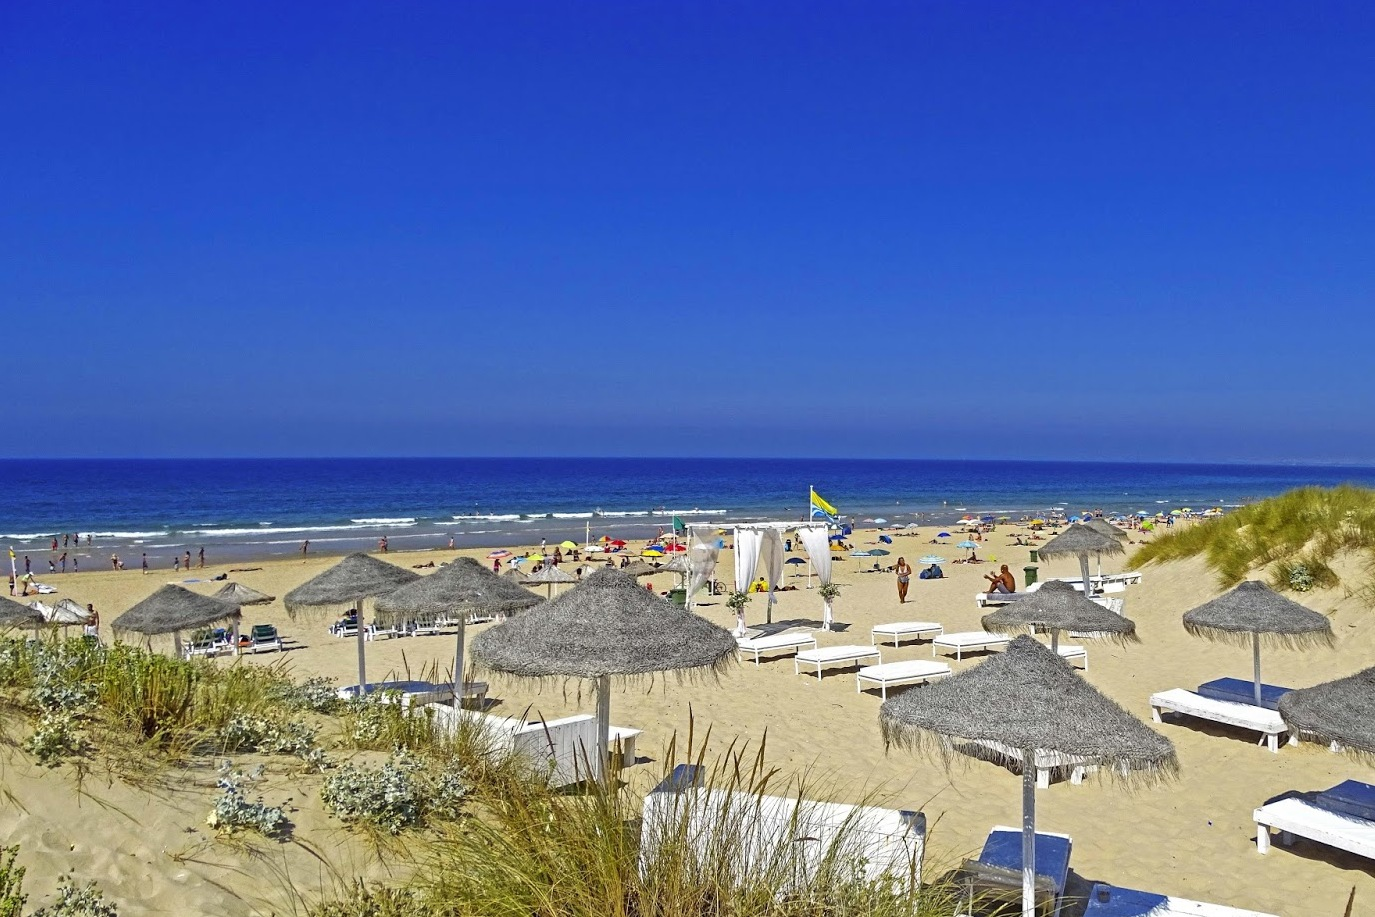 Praia do Infante